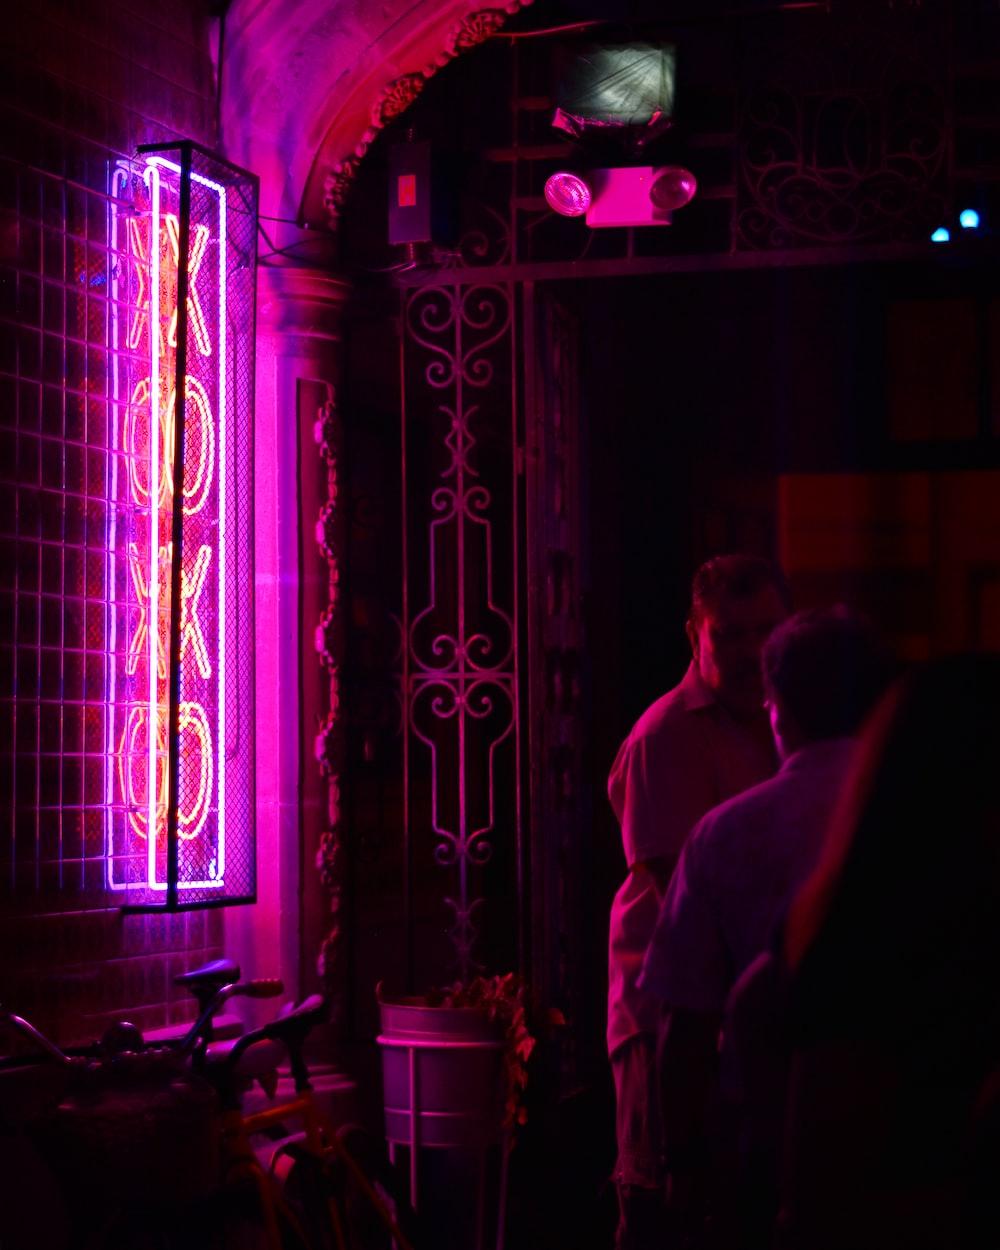 man standing on neon light